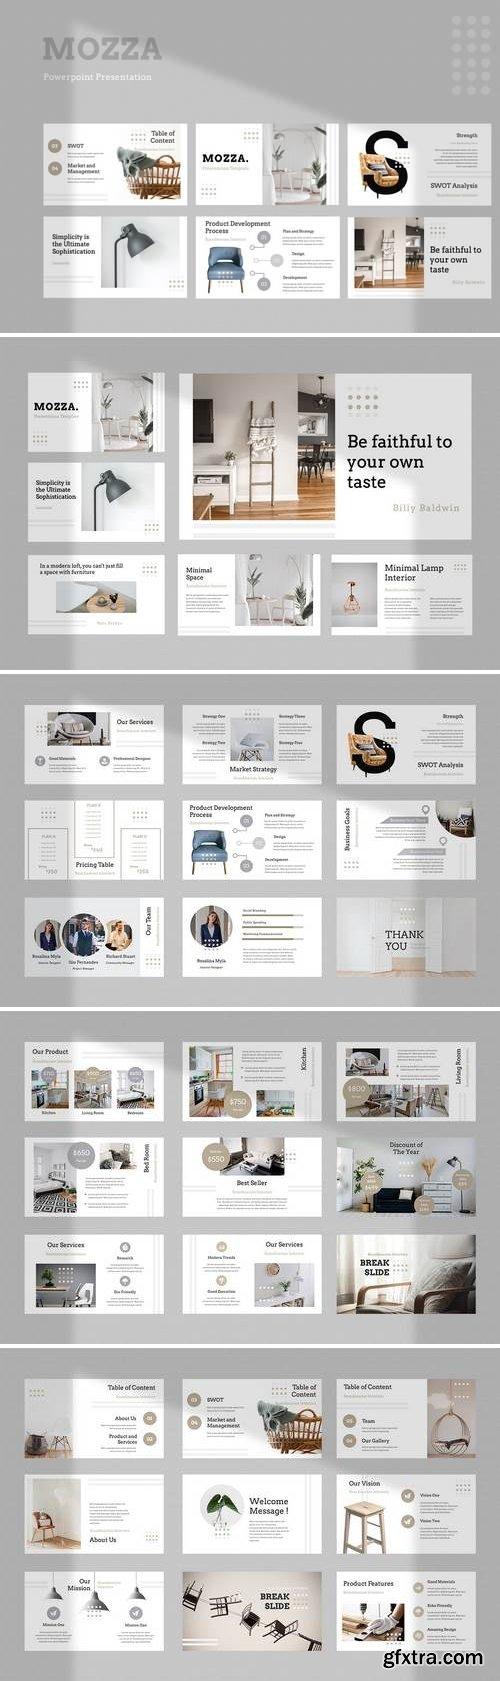 Mozza Furniture - Powerpoint, Keynote, Google Sliders Templates